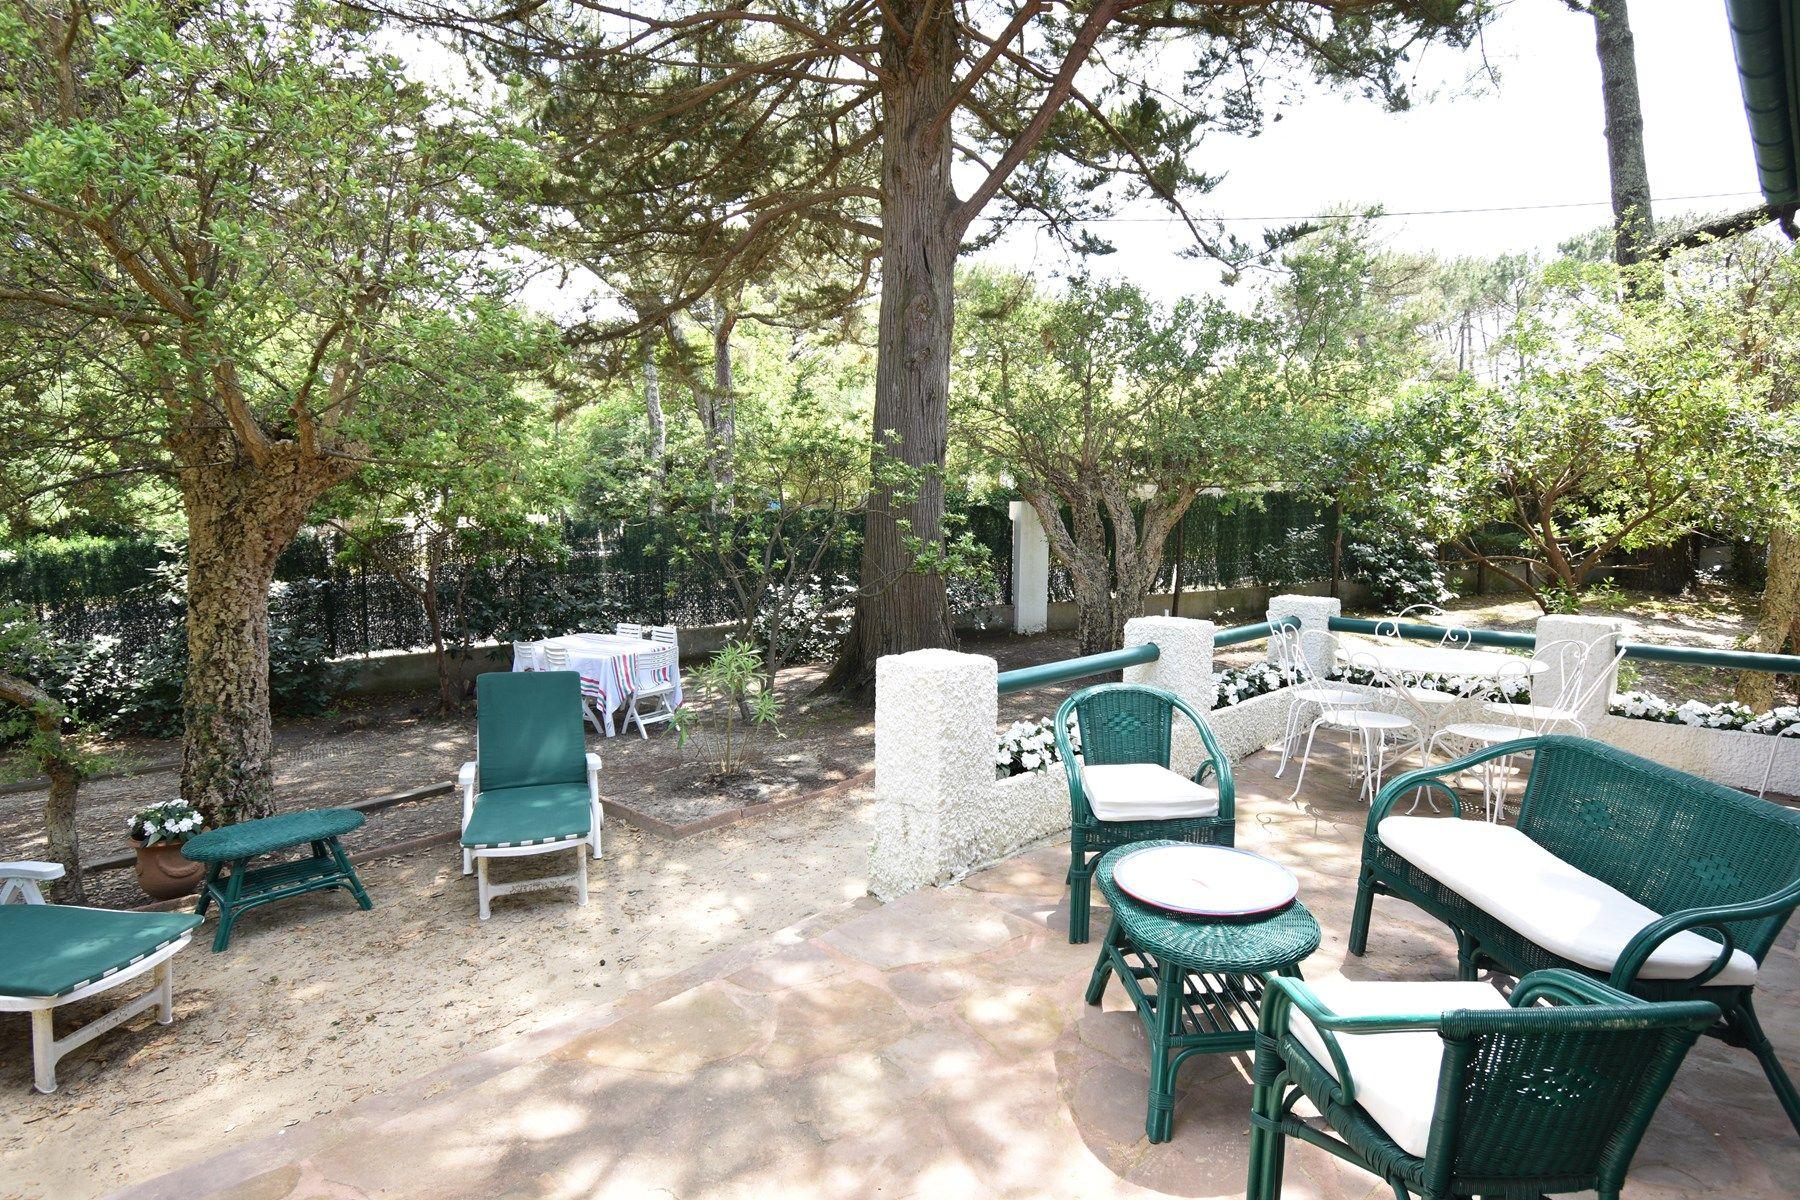 location de vacances à Hossegor ref:0585